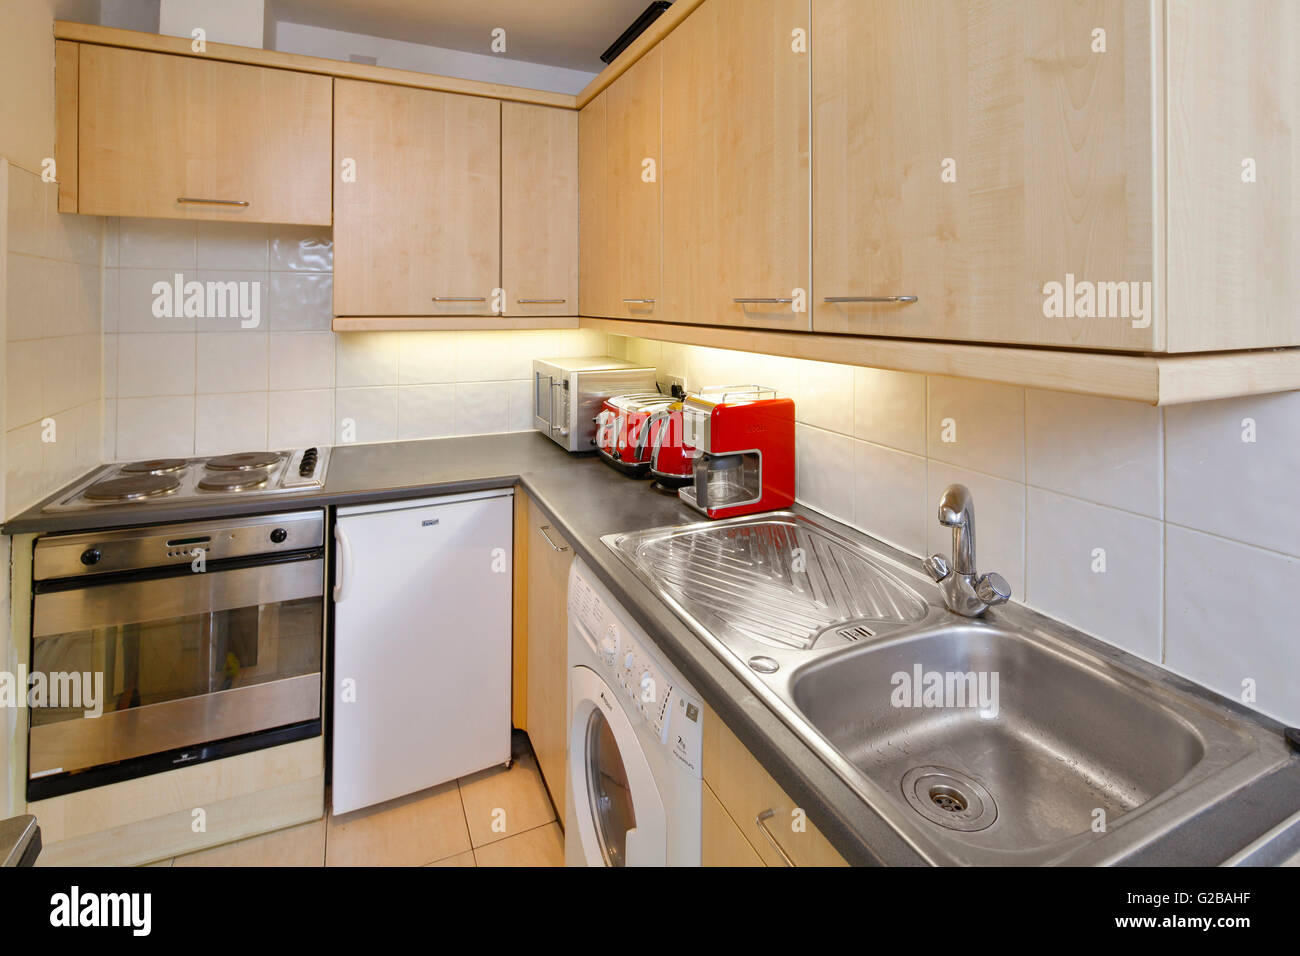 Netherhall Stockfotos & Netherhall Bilder - Alamy